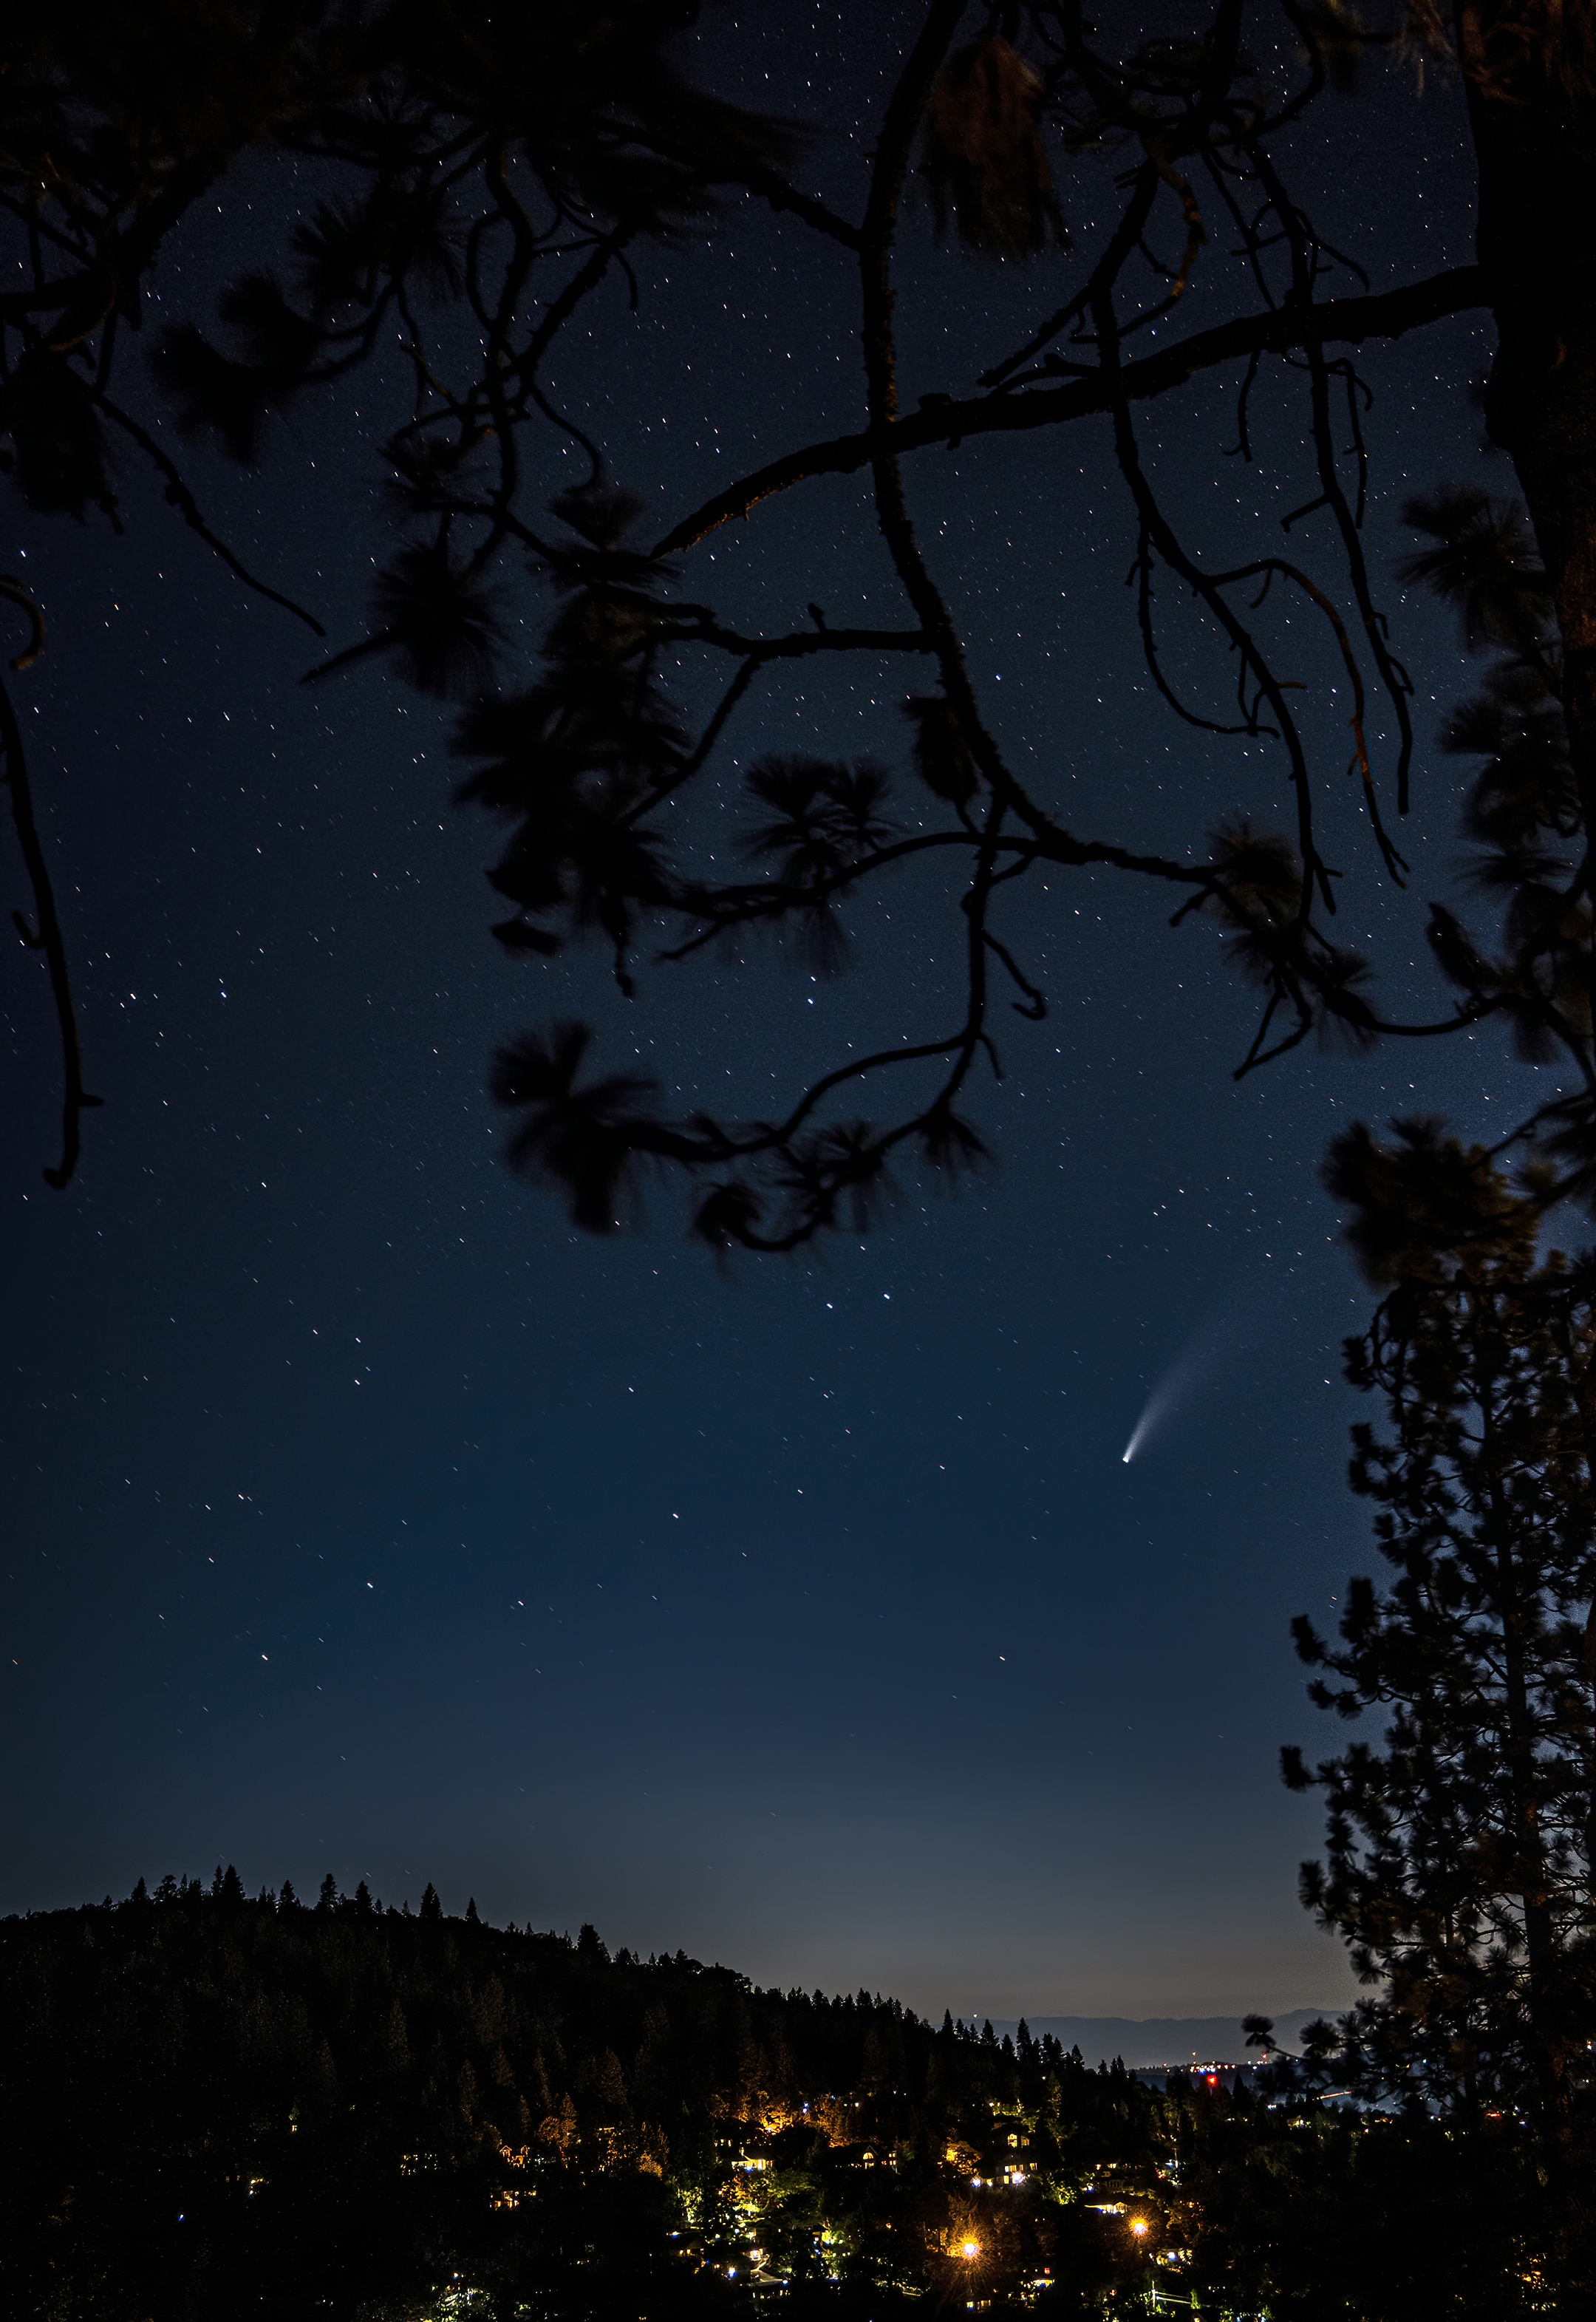 comet NEOWISE topaz denoise ai-denoise